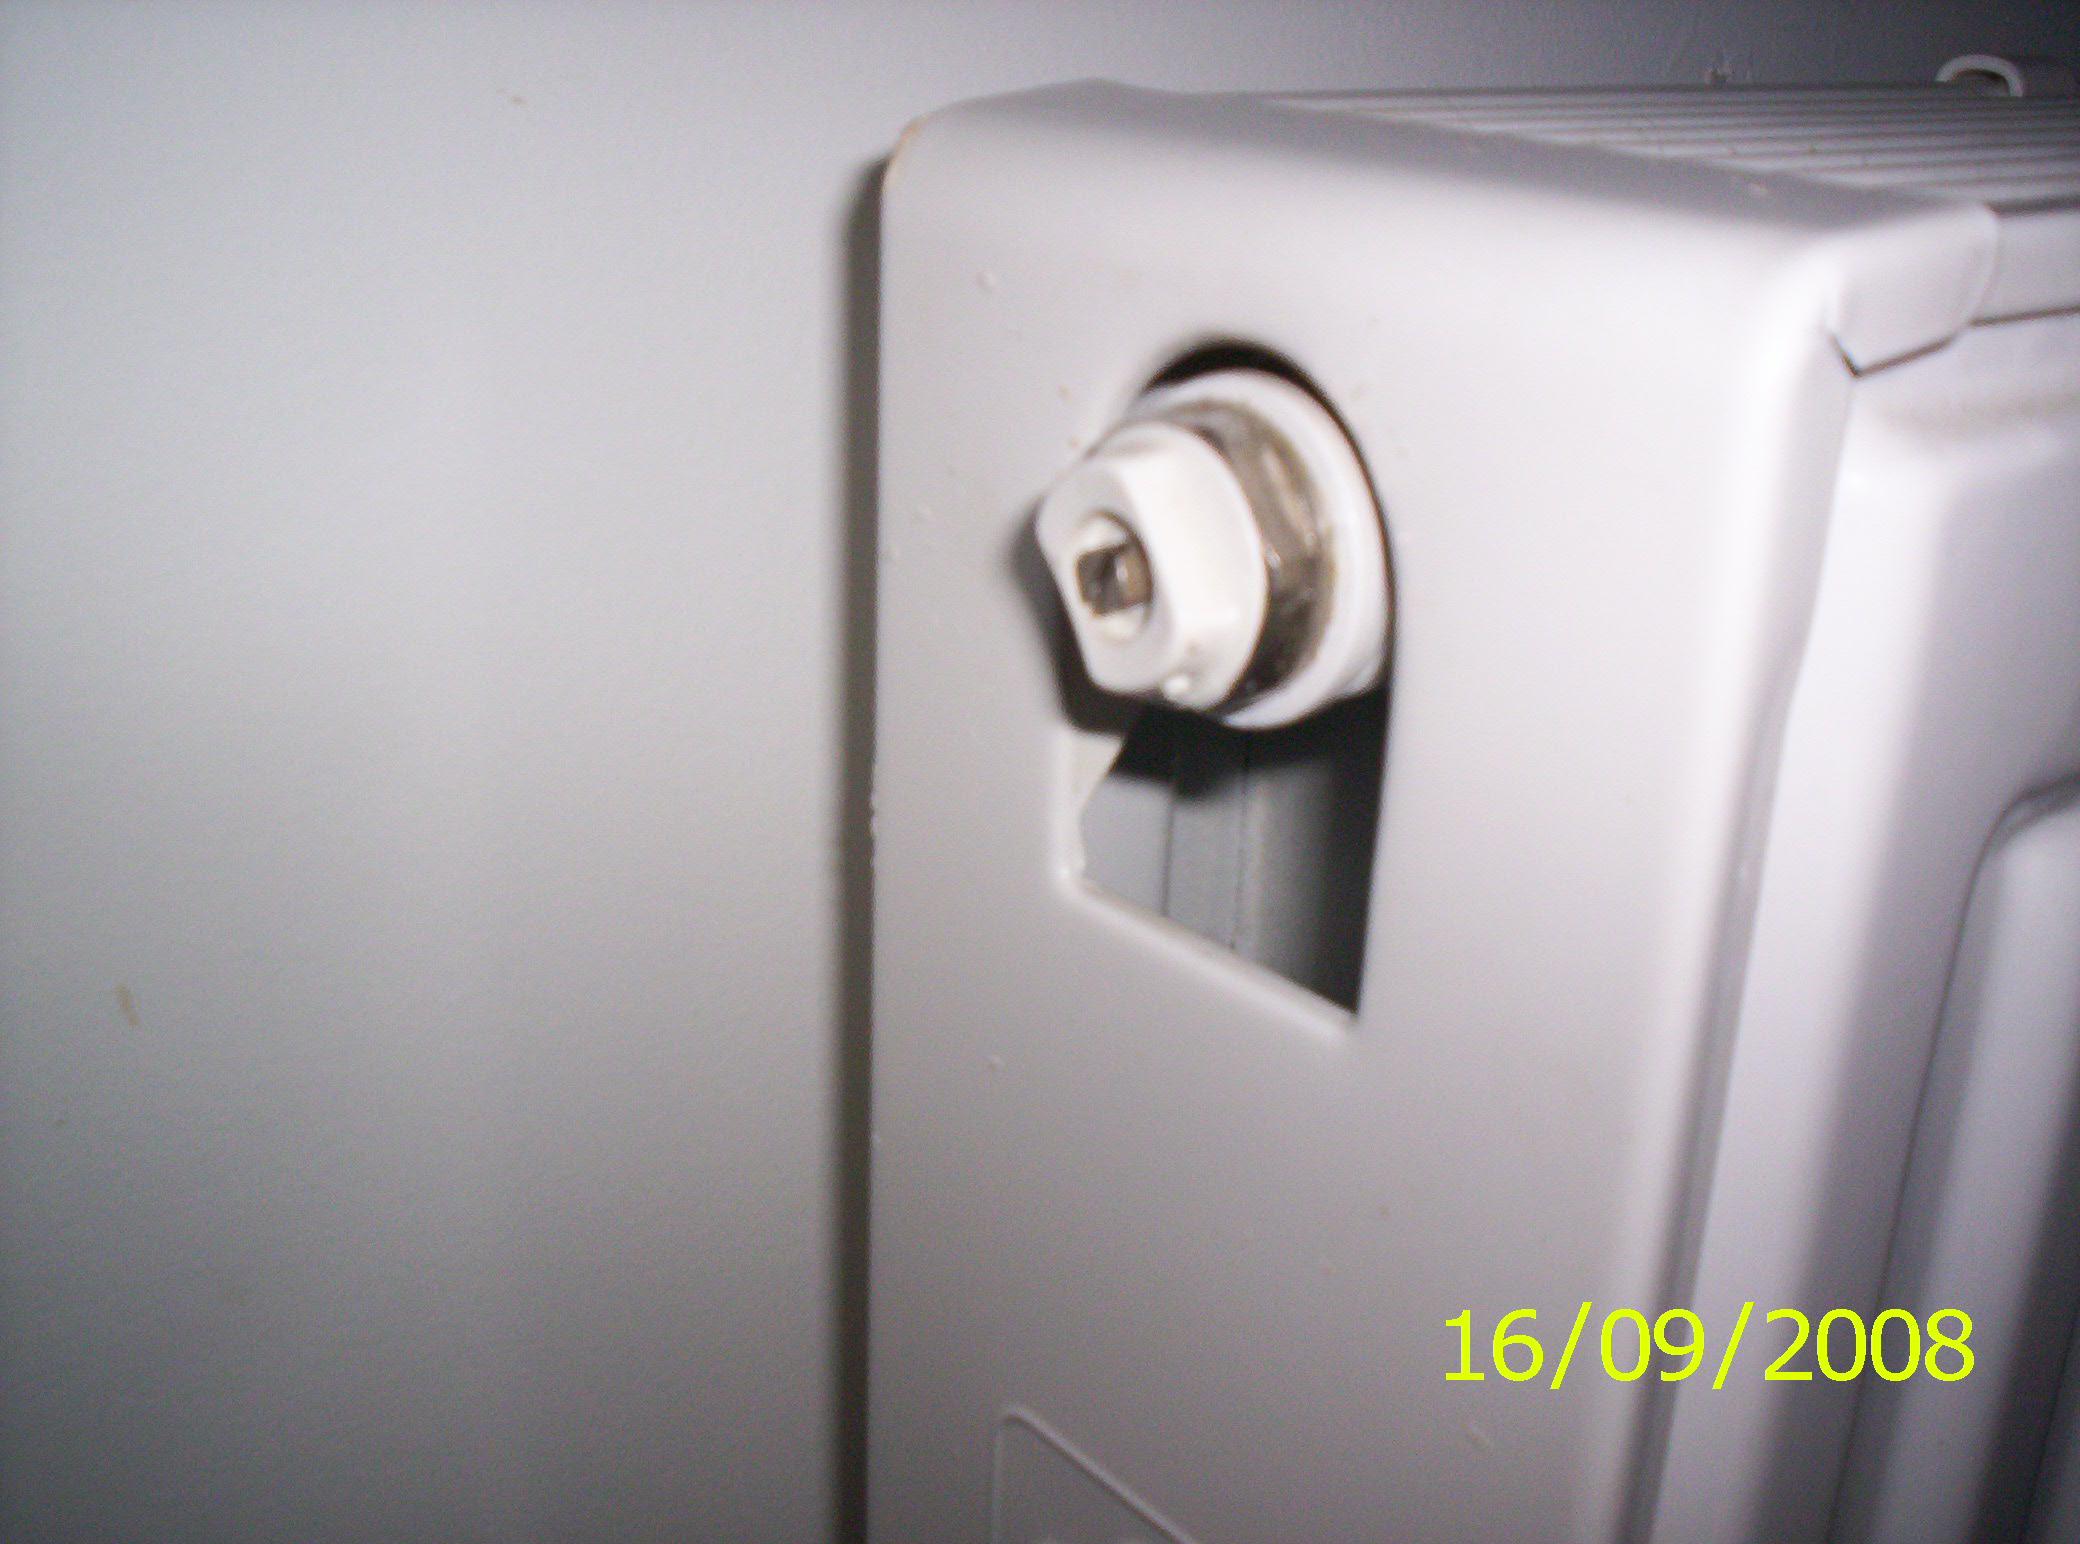 vidange radiateur stunning vidange de radiateur robinets boisseau ff with vidange radiateur. Black Bedroom Furniture Sets. Home Design Ideas